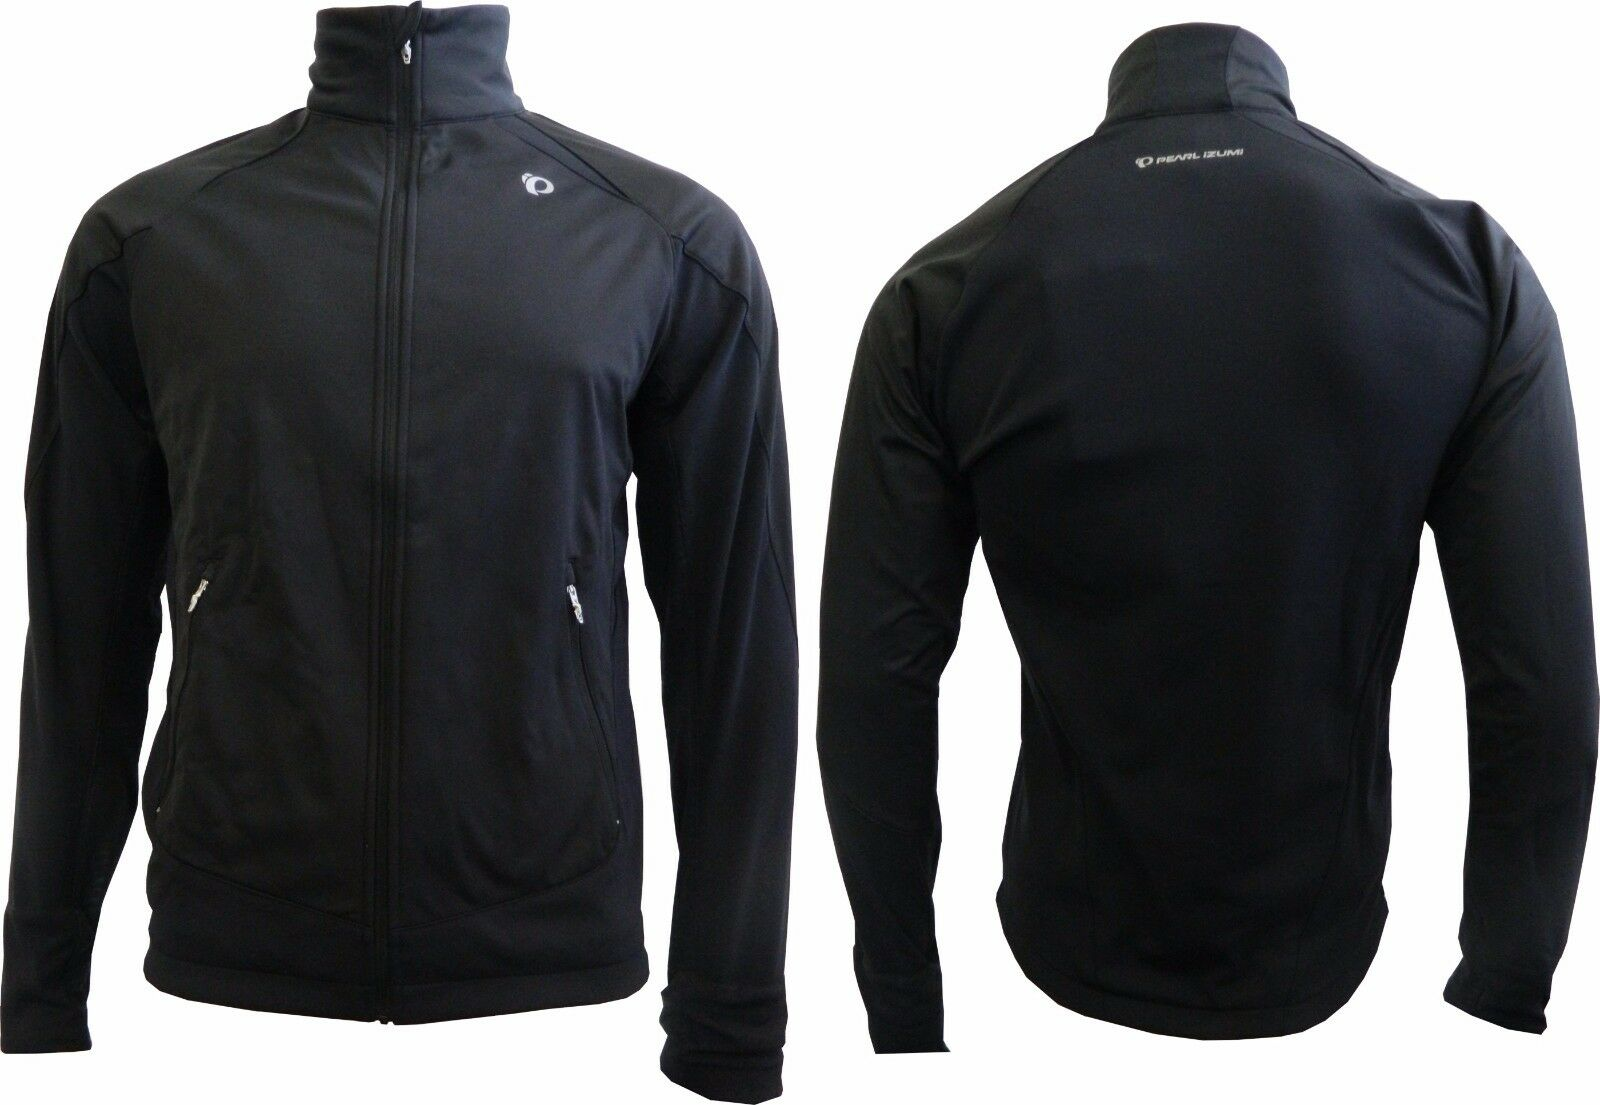 Pearl Izumi   Fly Softshell Run Jacket Jacket Jacket    Sport Jacke   - NEU  24 ea2554